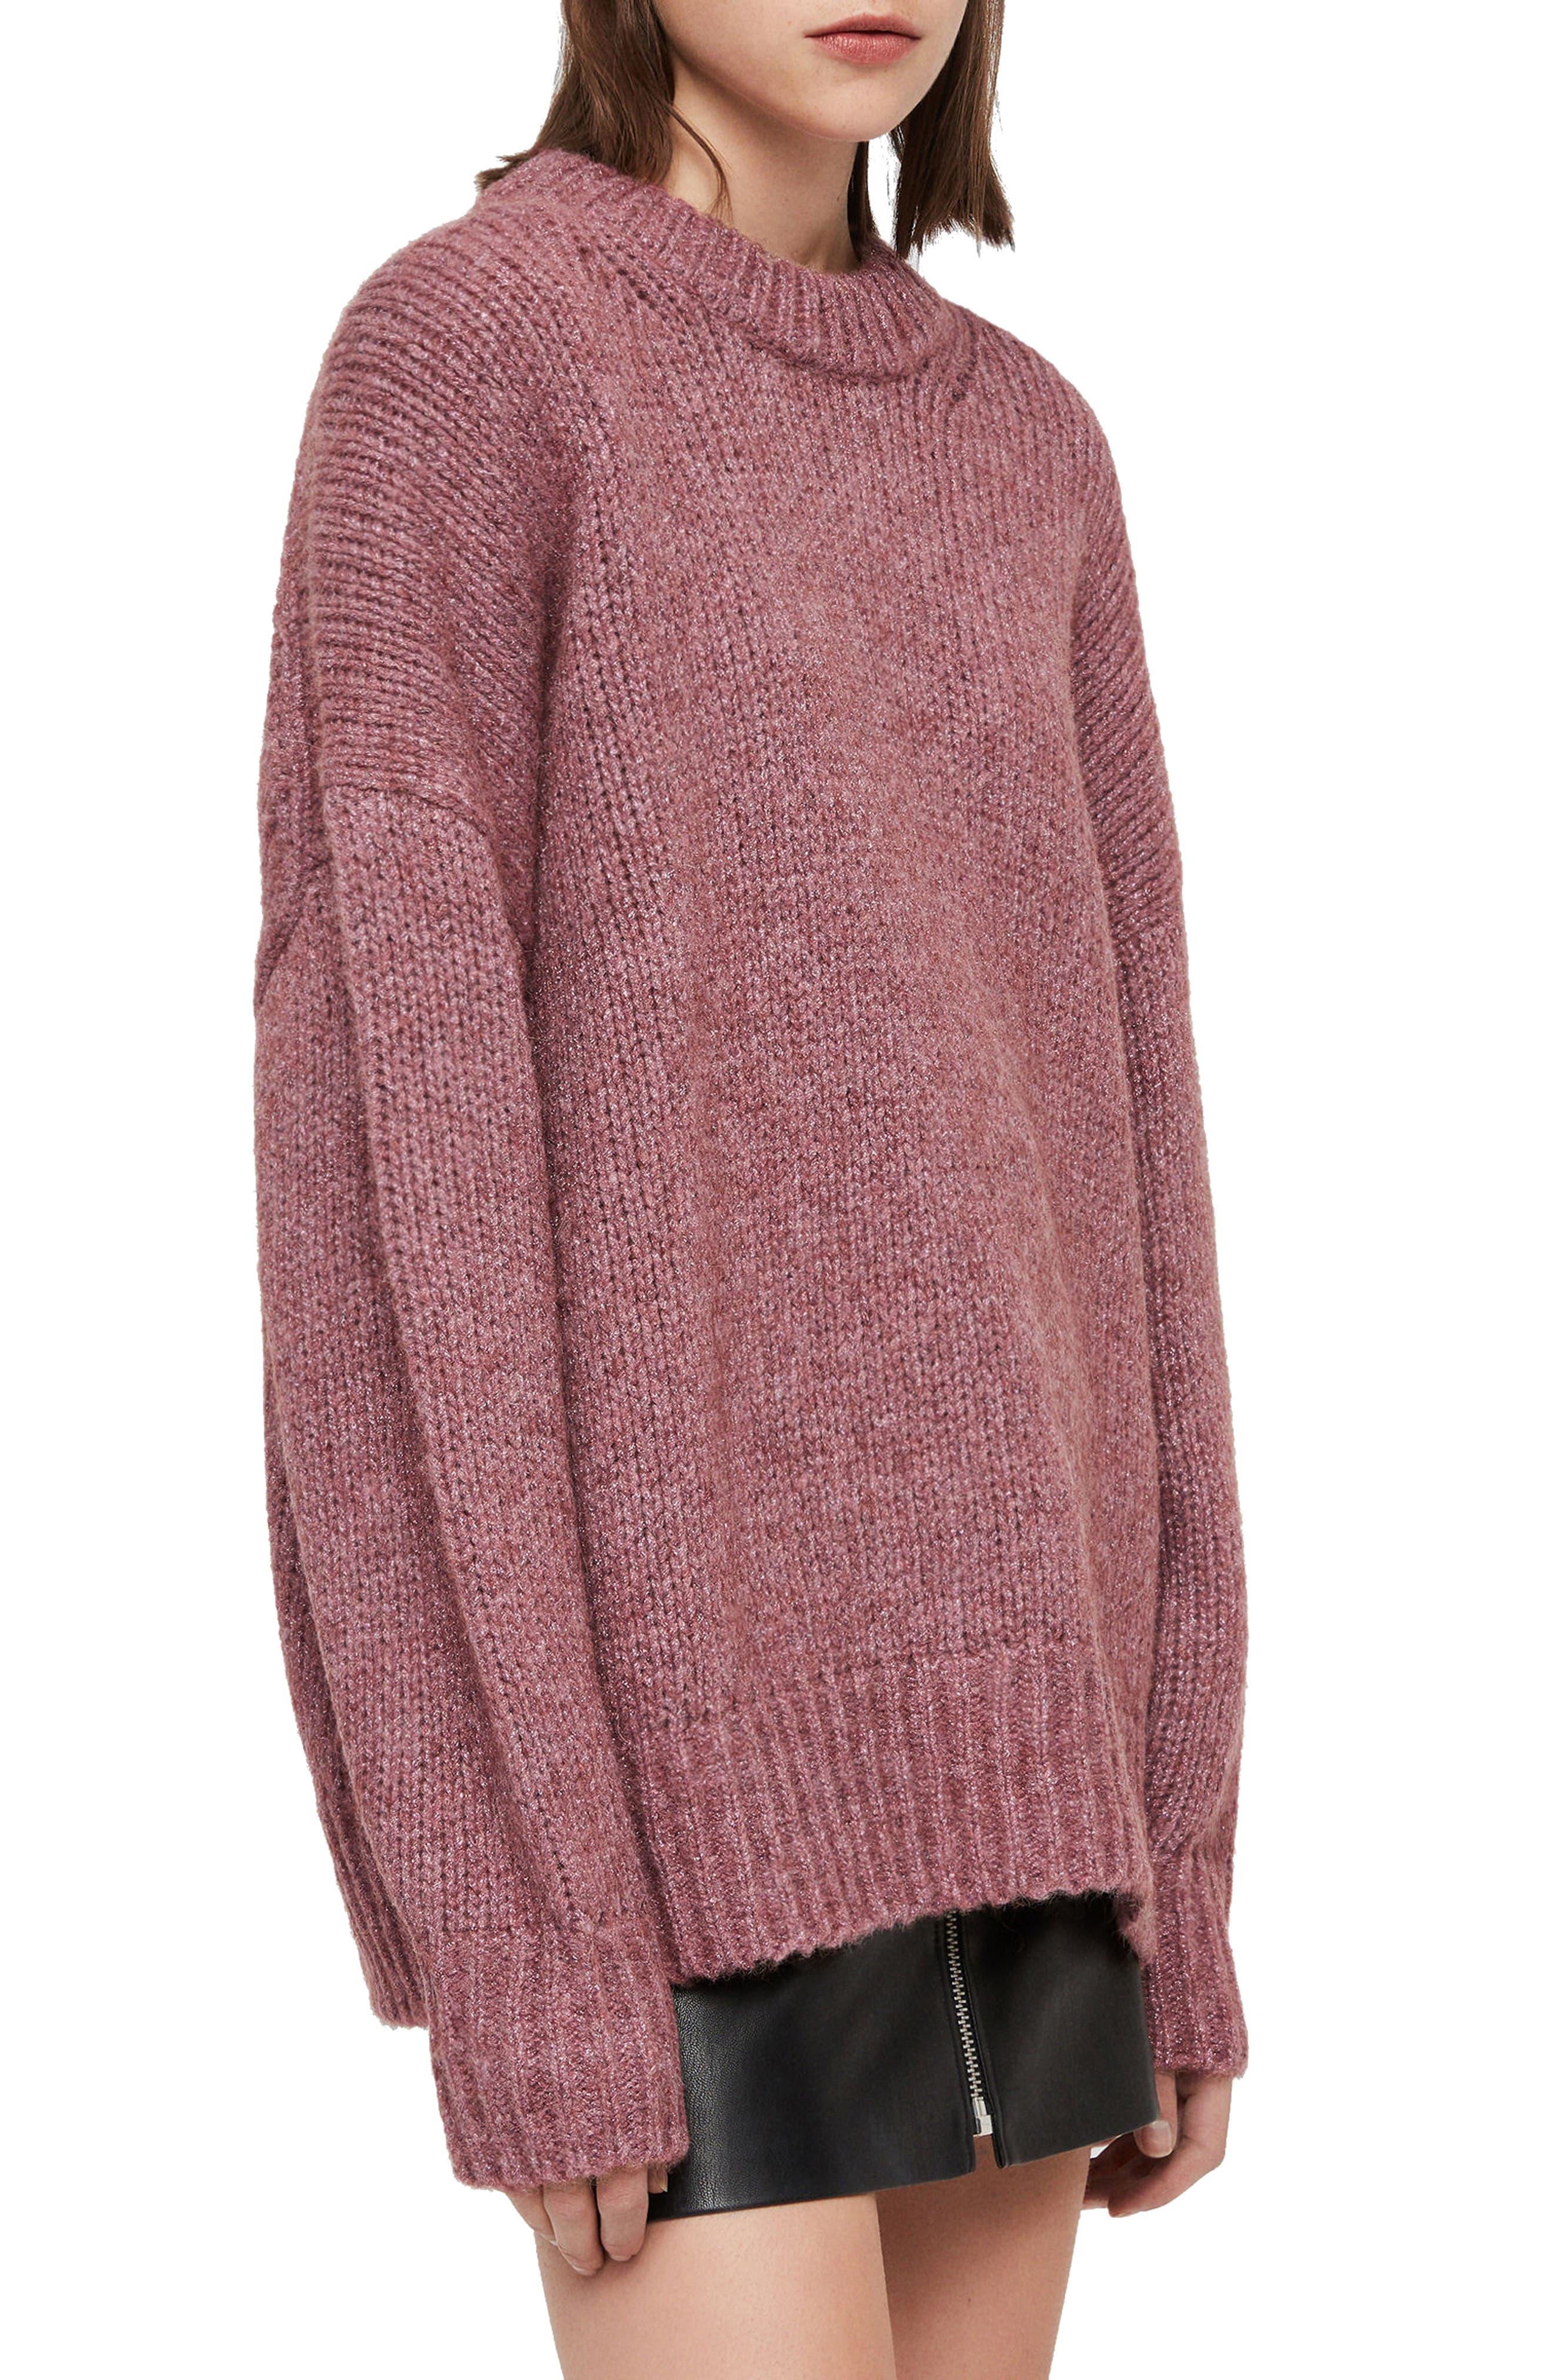 ALLSAINTS, Gemini Metallic Knit Sweater, Alternate thumbnail 3, color, 653